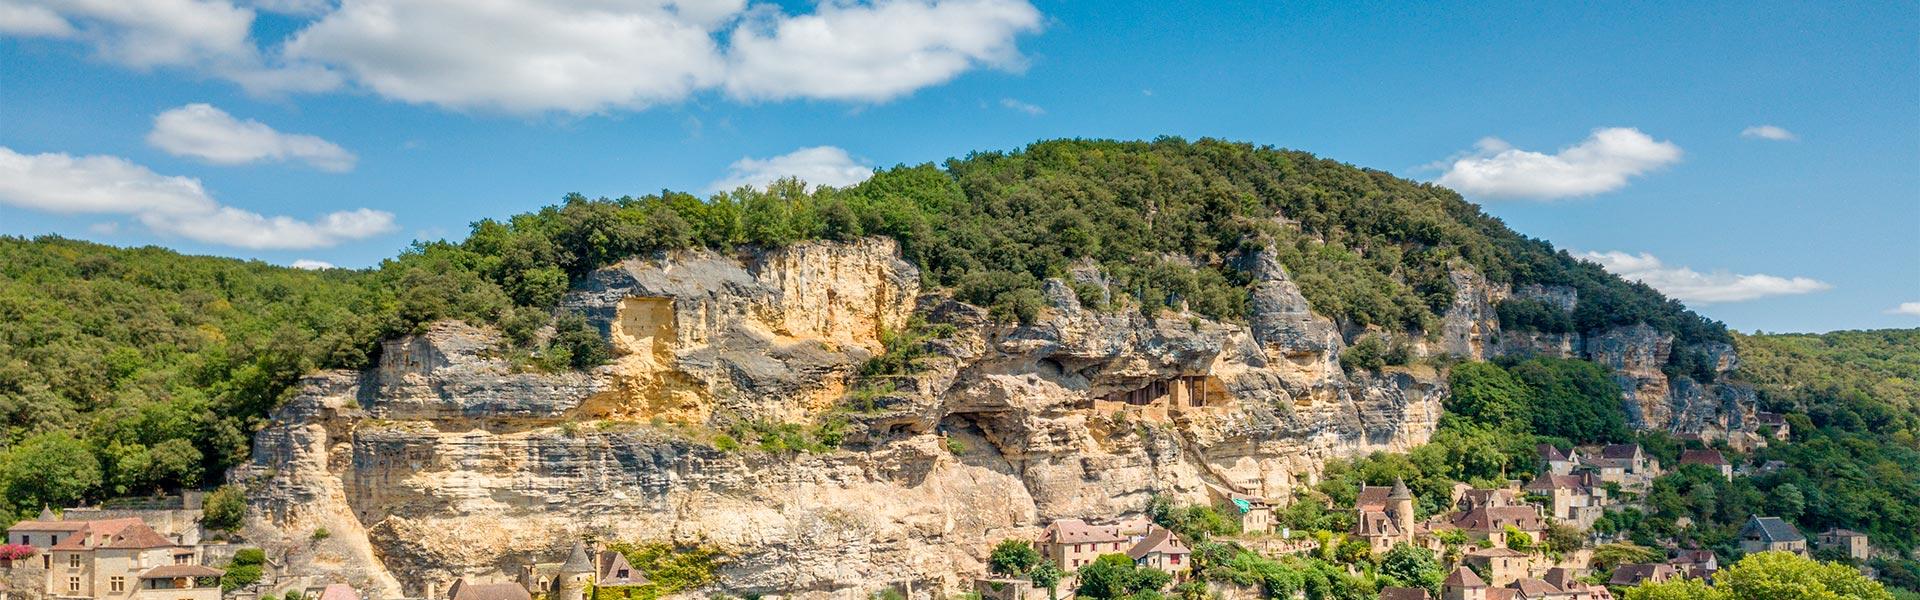 Camping La Roque-Gageac